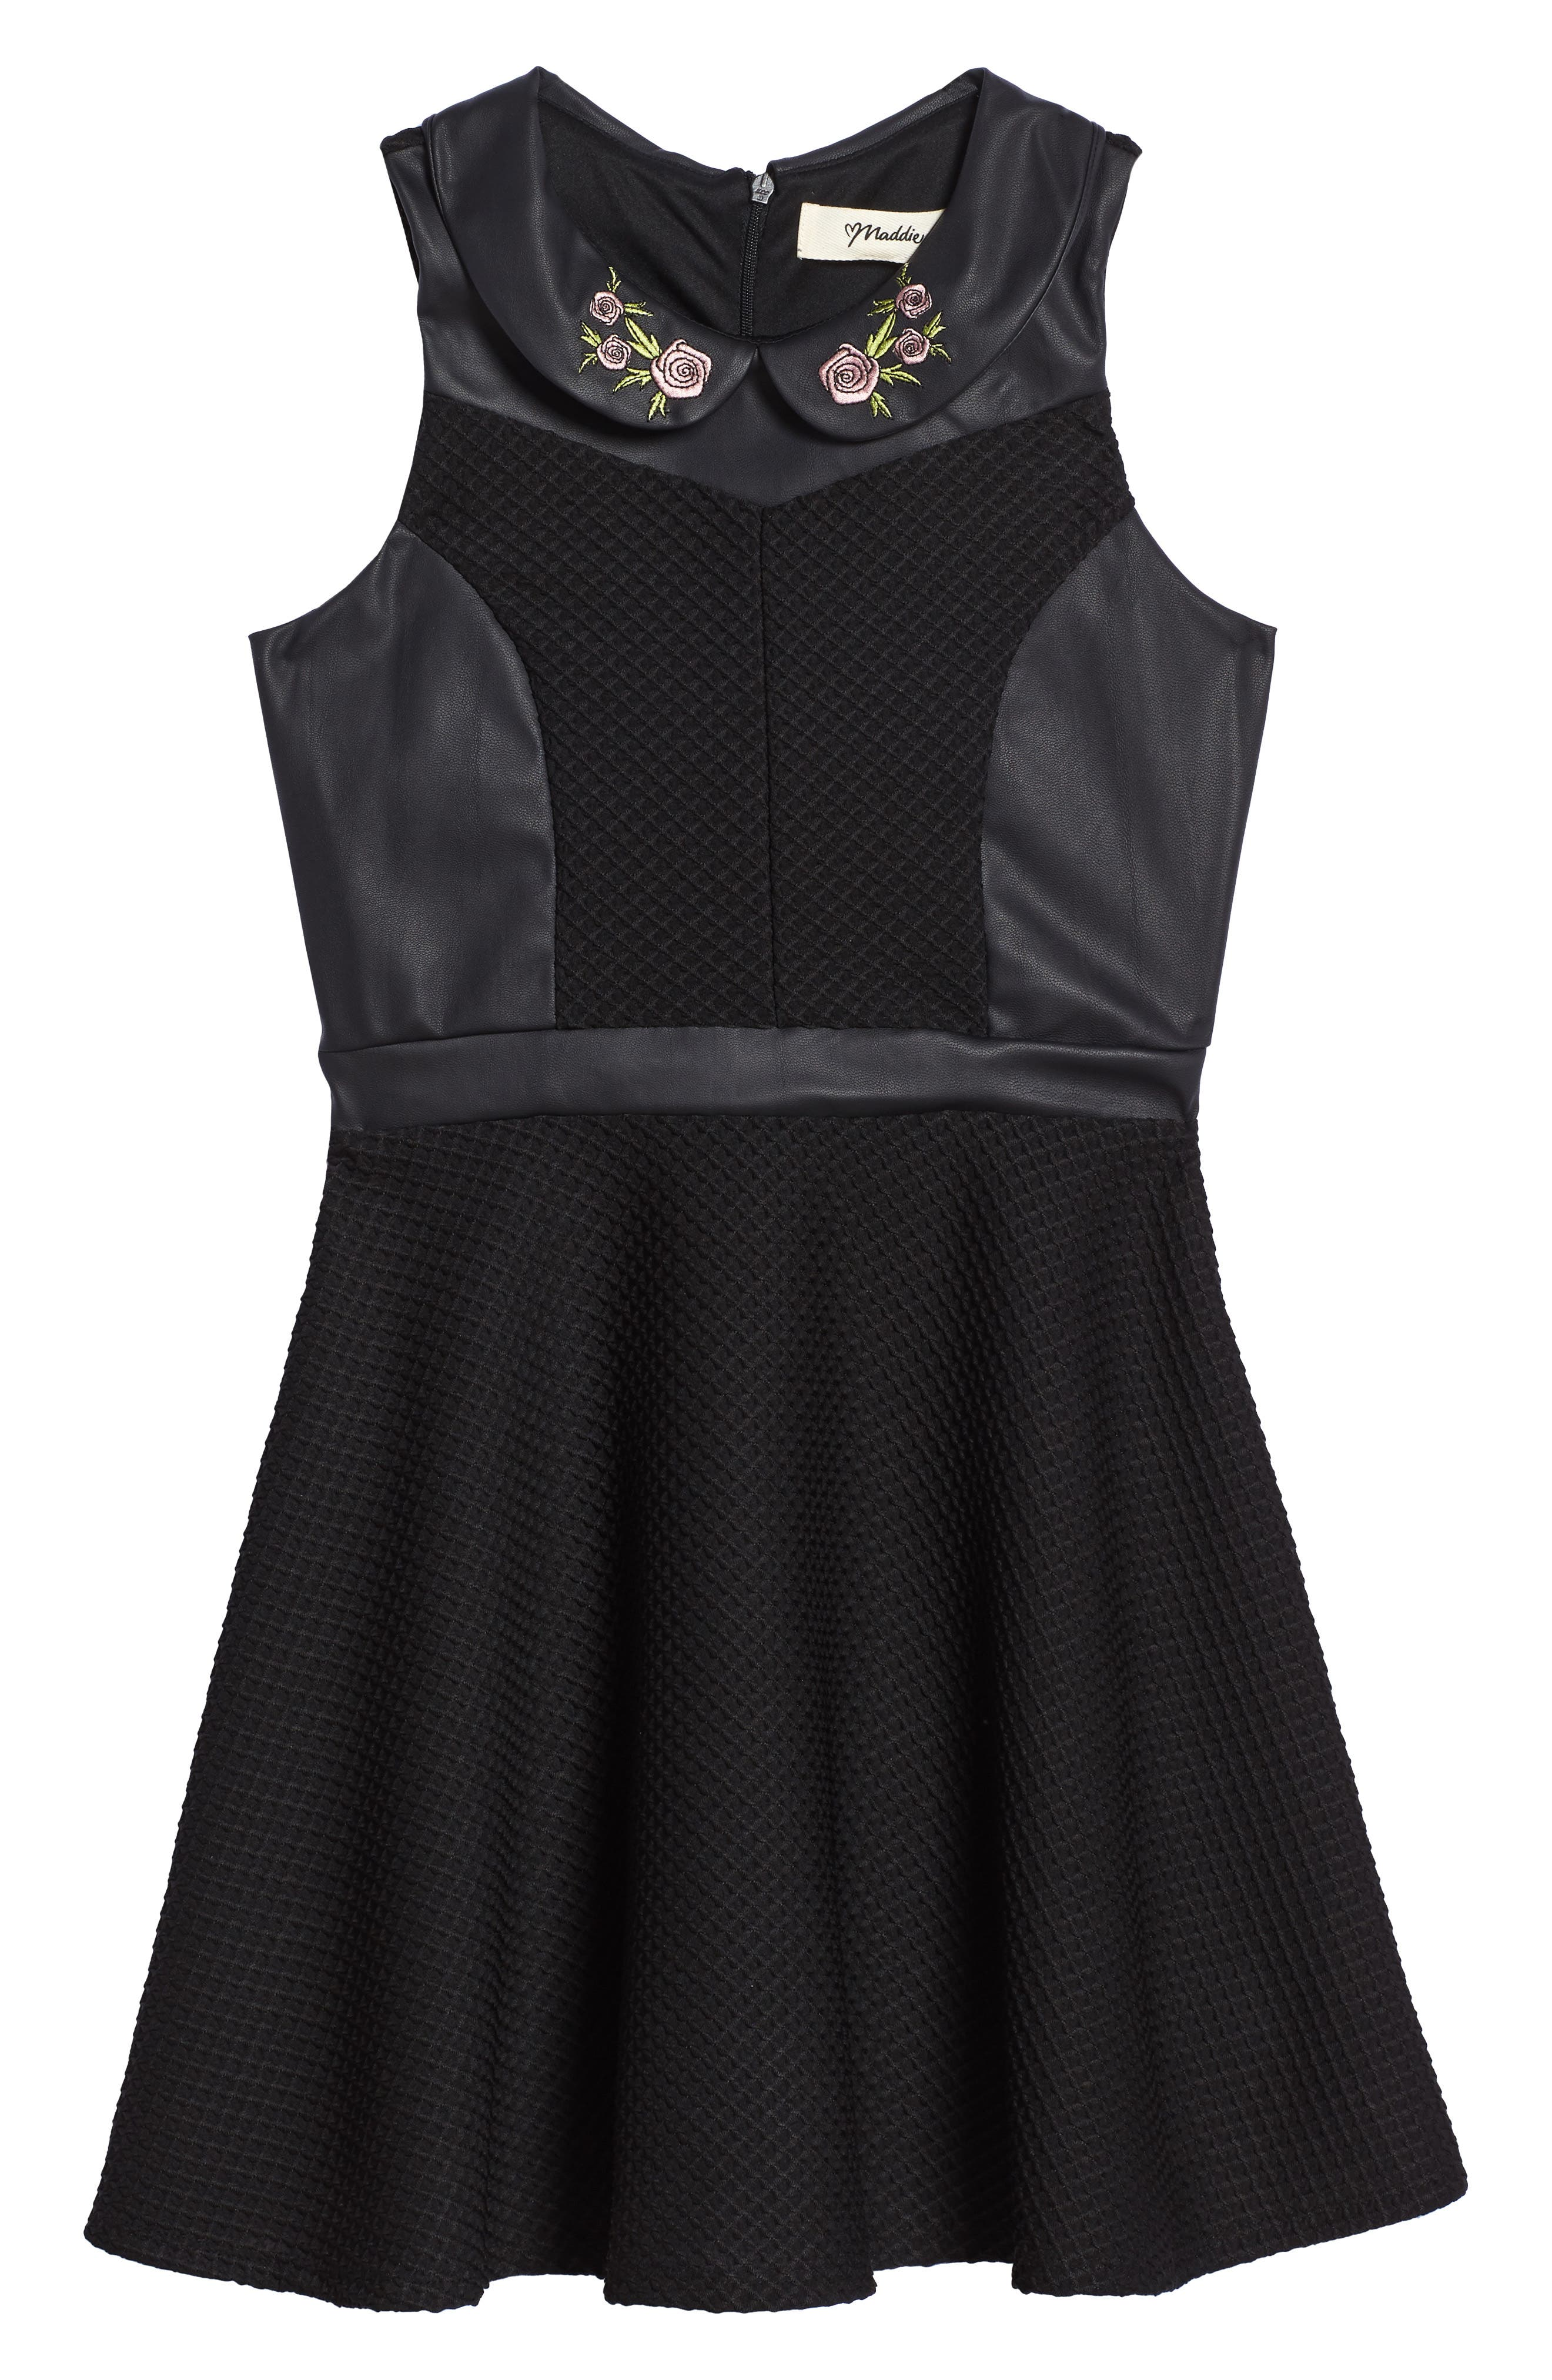 Alternate Image 1 Selected - Maddie Faux Leather Skater Dress (Big Girls)